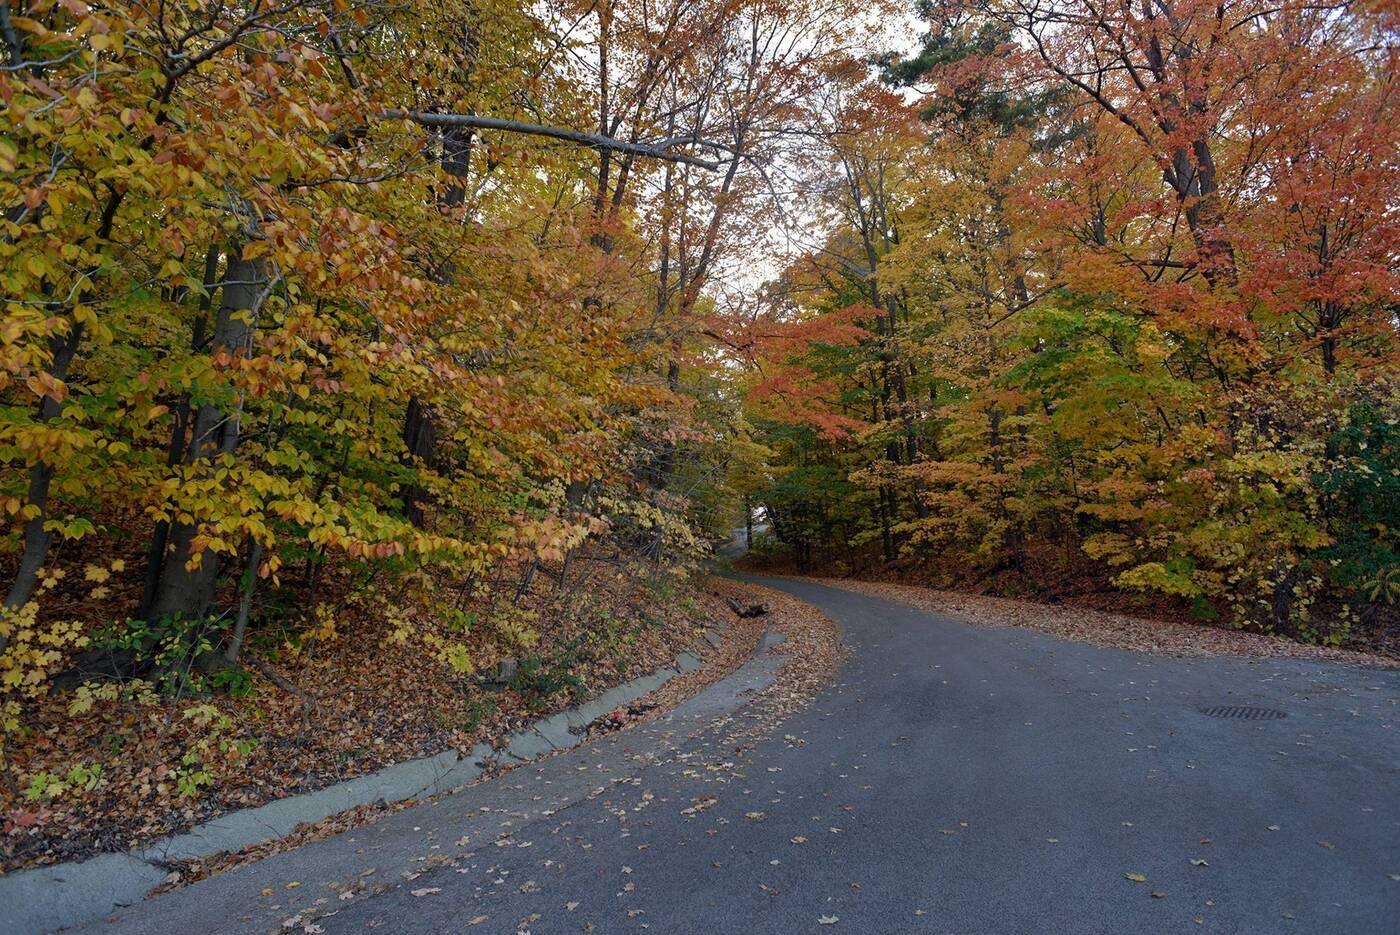 redway road